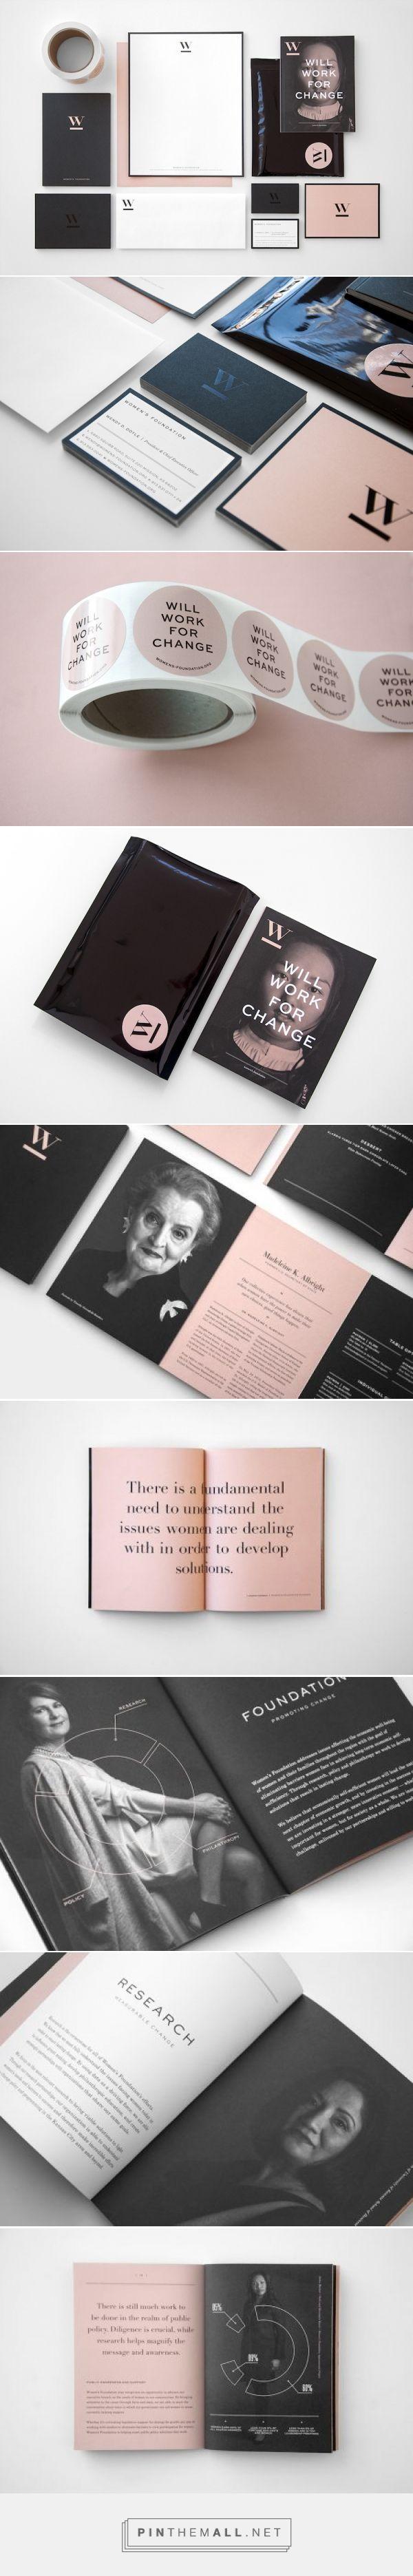 Award-Winning Brand Identity Design: The Women's Foundation